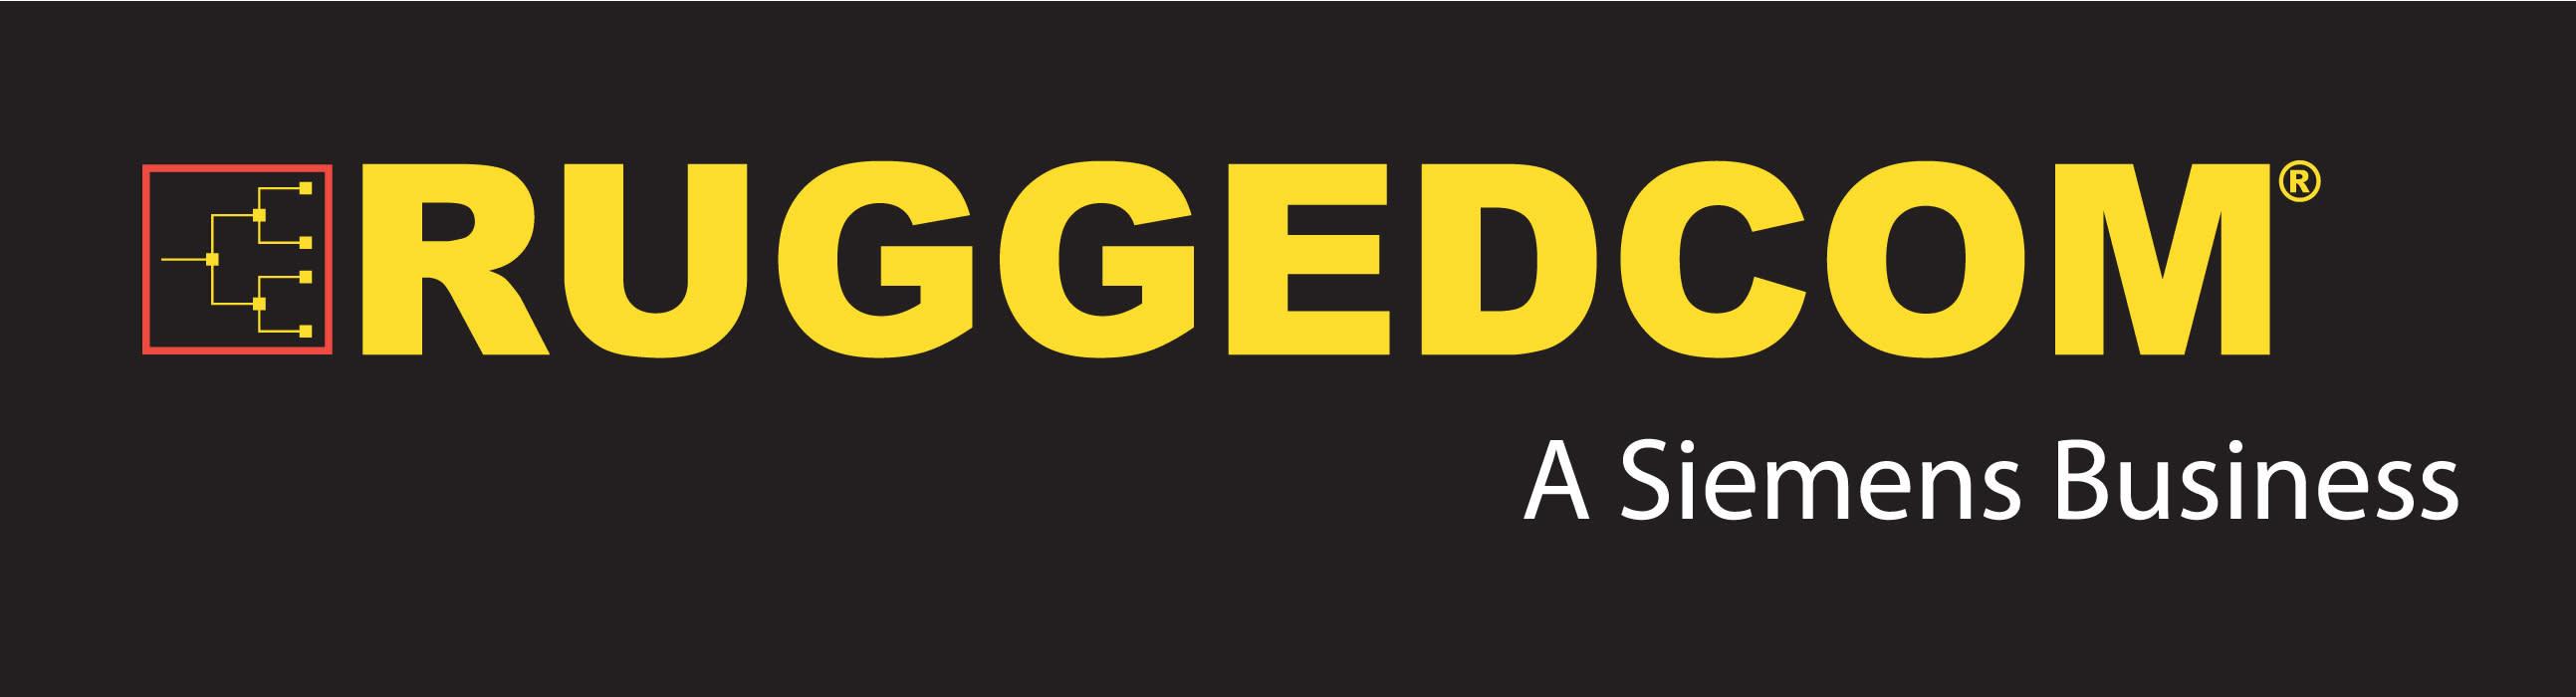 RuggedCom - Crunchbase Company Profile & Funding